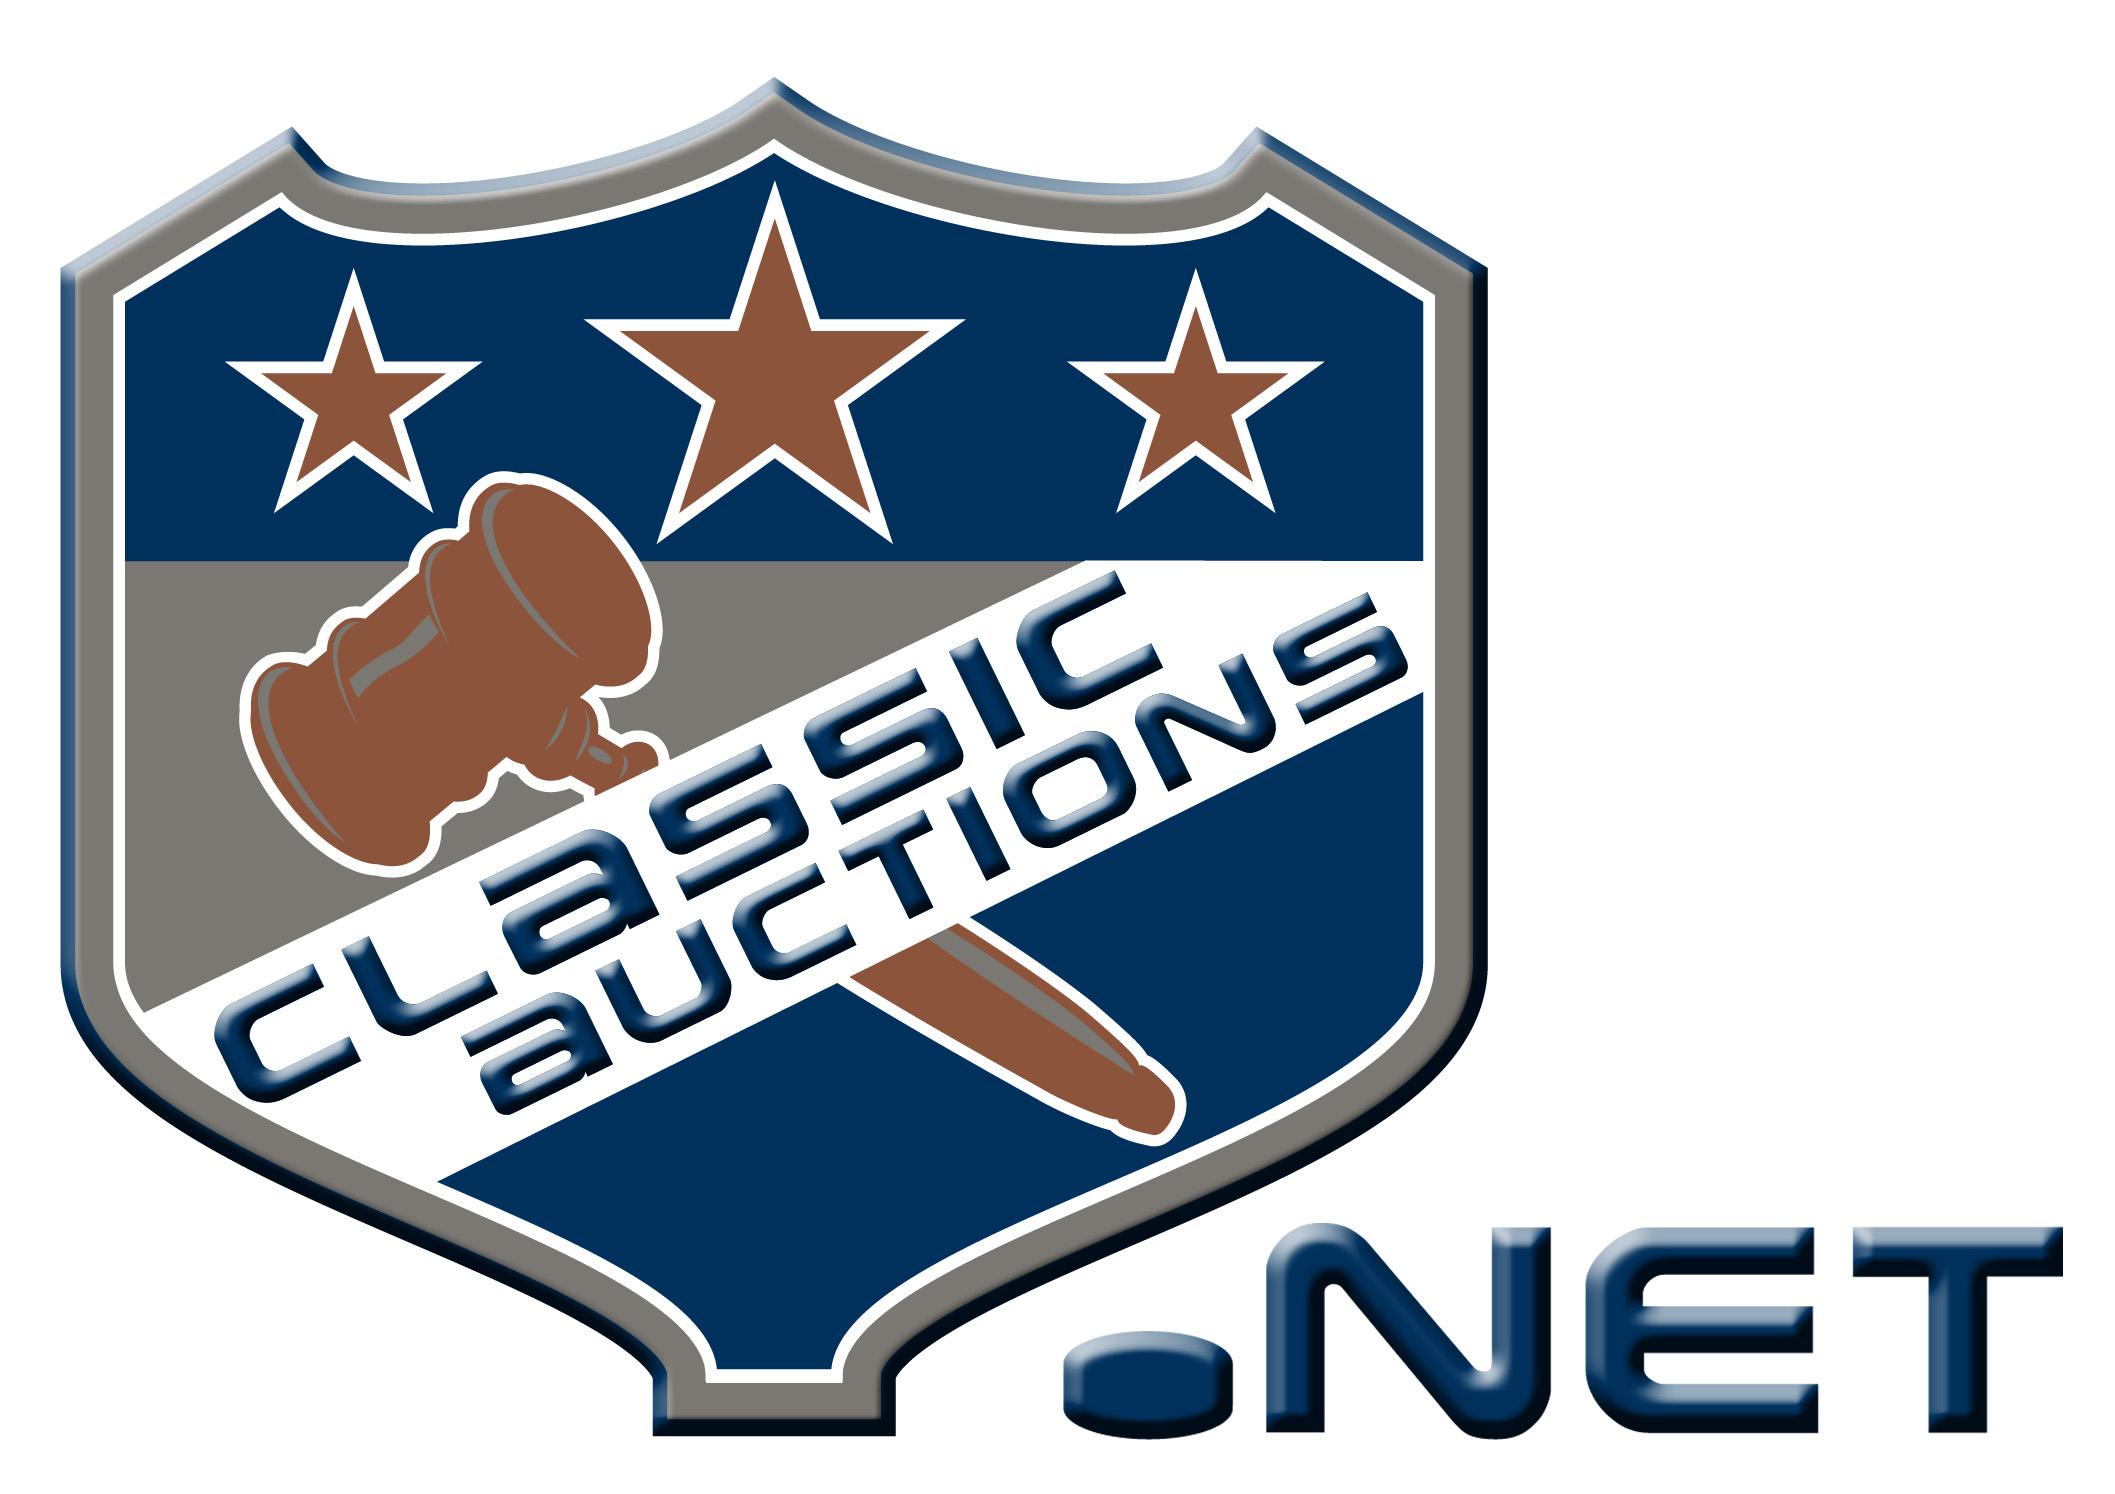 Classic Auctions Inc.